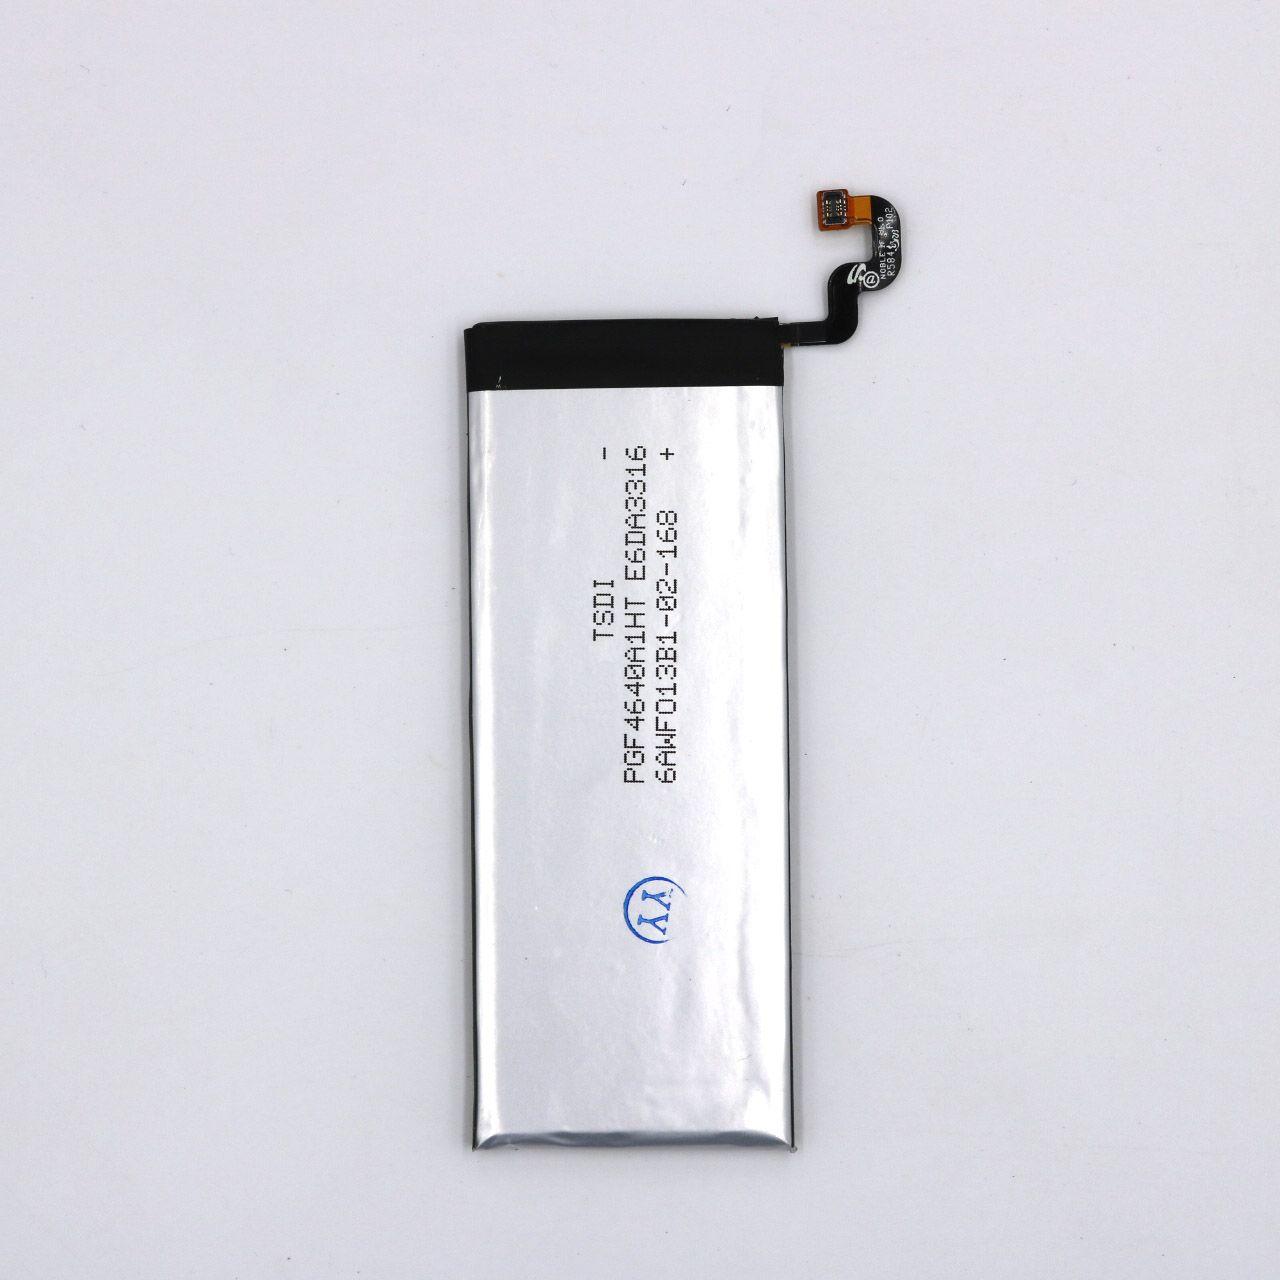 For SAMSUNG Galaxy NOTE 5 Battery EB-BN920ABE 3000mAh N920 Phone batterie For Samsung Galaxy Note5 Built-in Replacement Bateria Akku